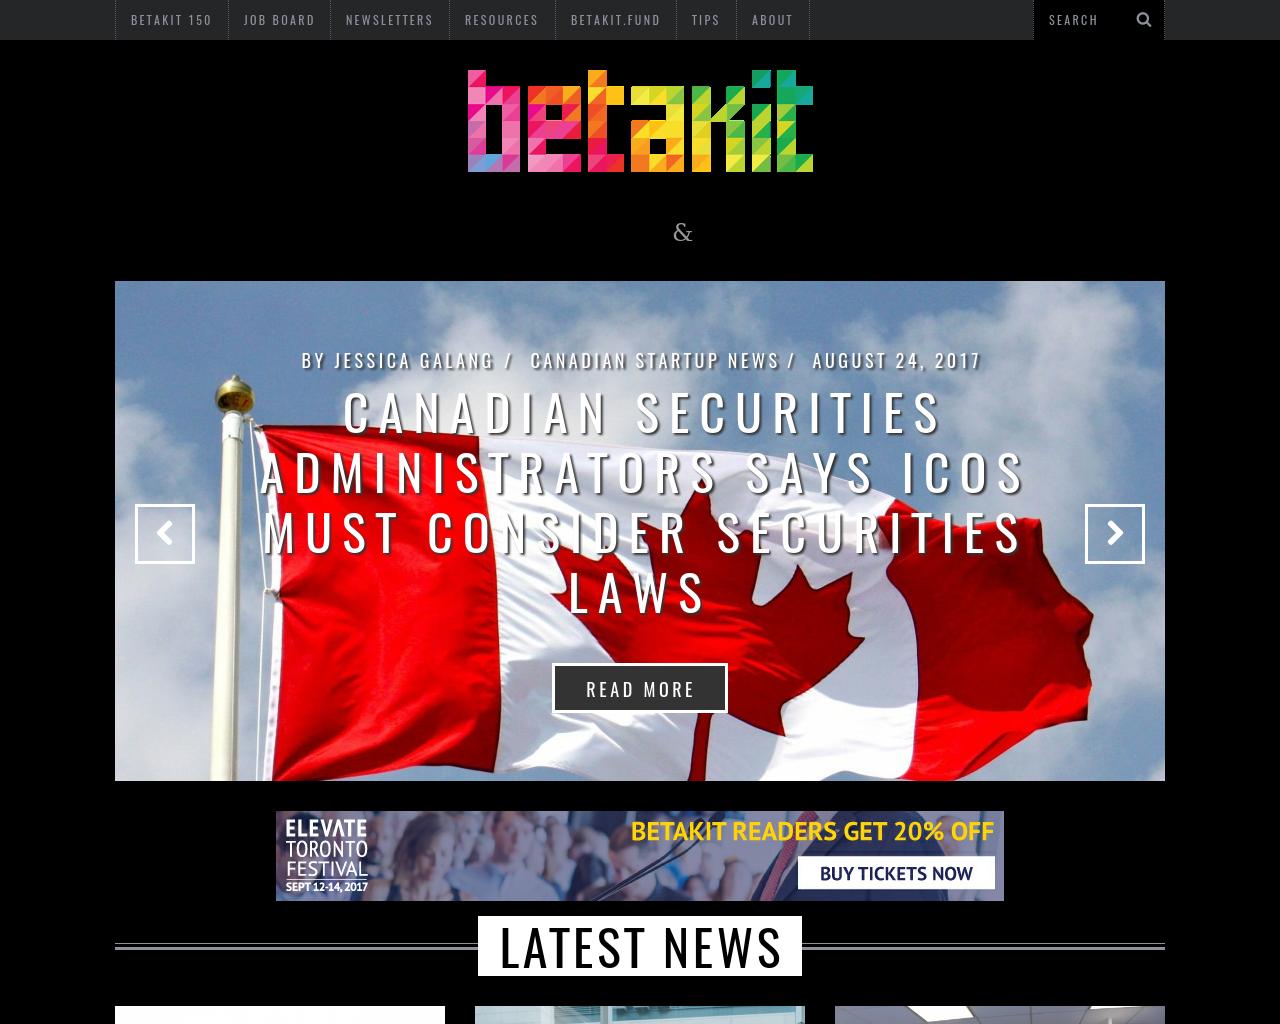 betakit-Advertising-Reviews-Pricing